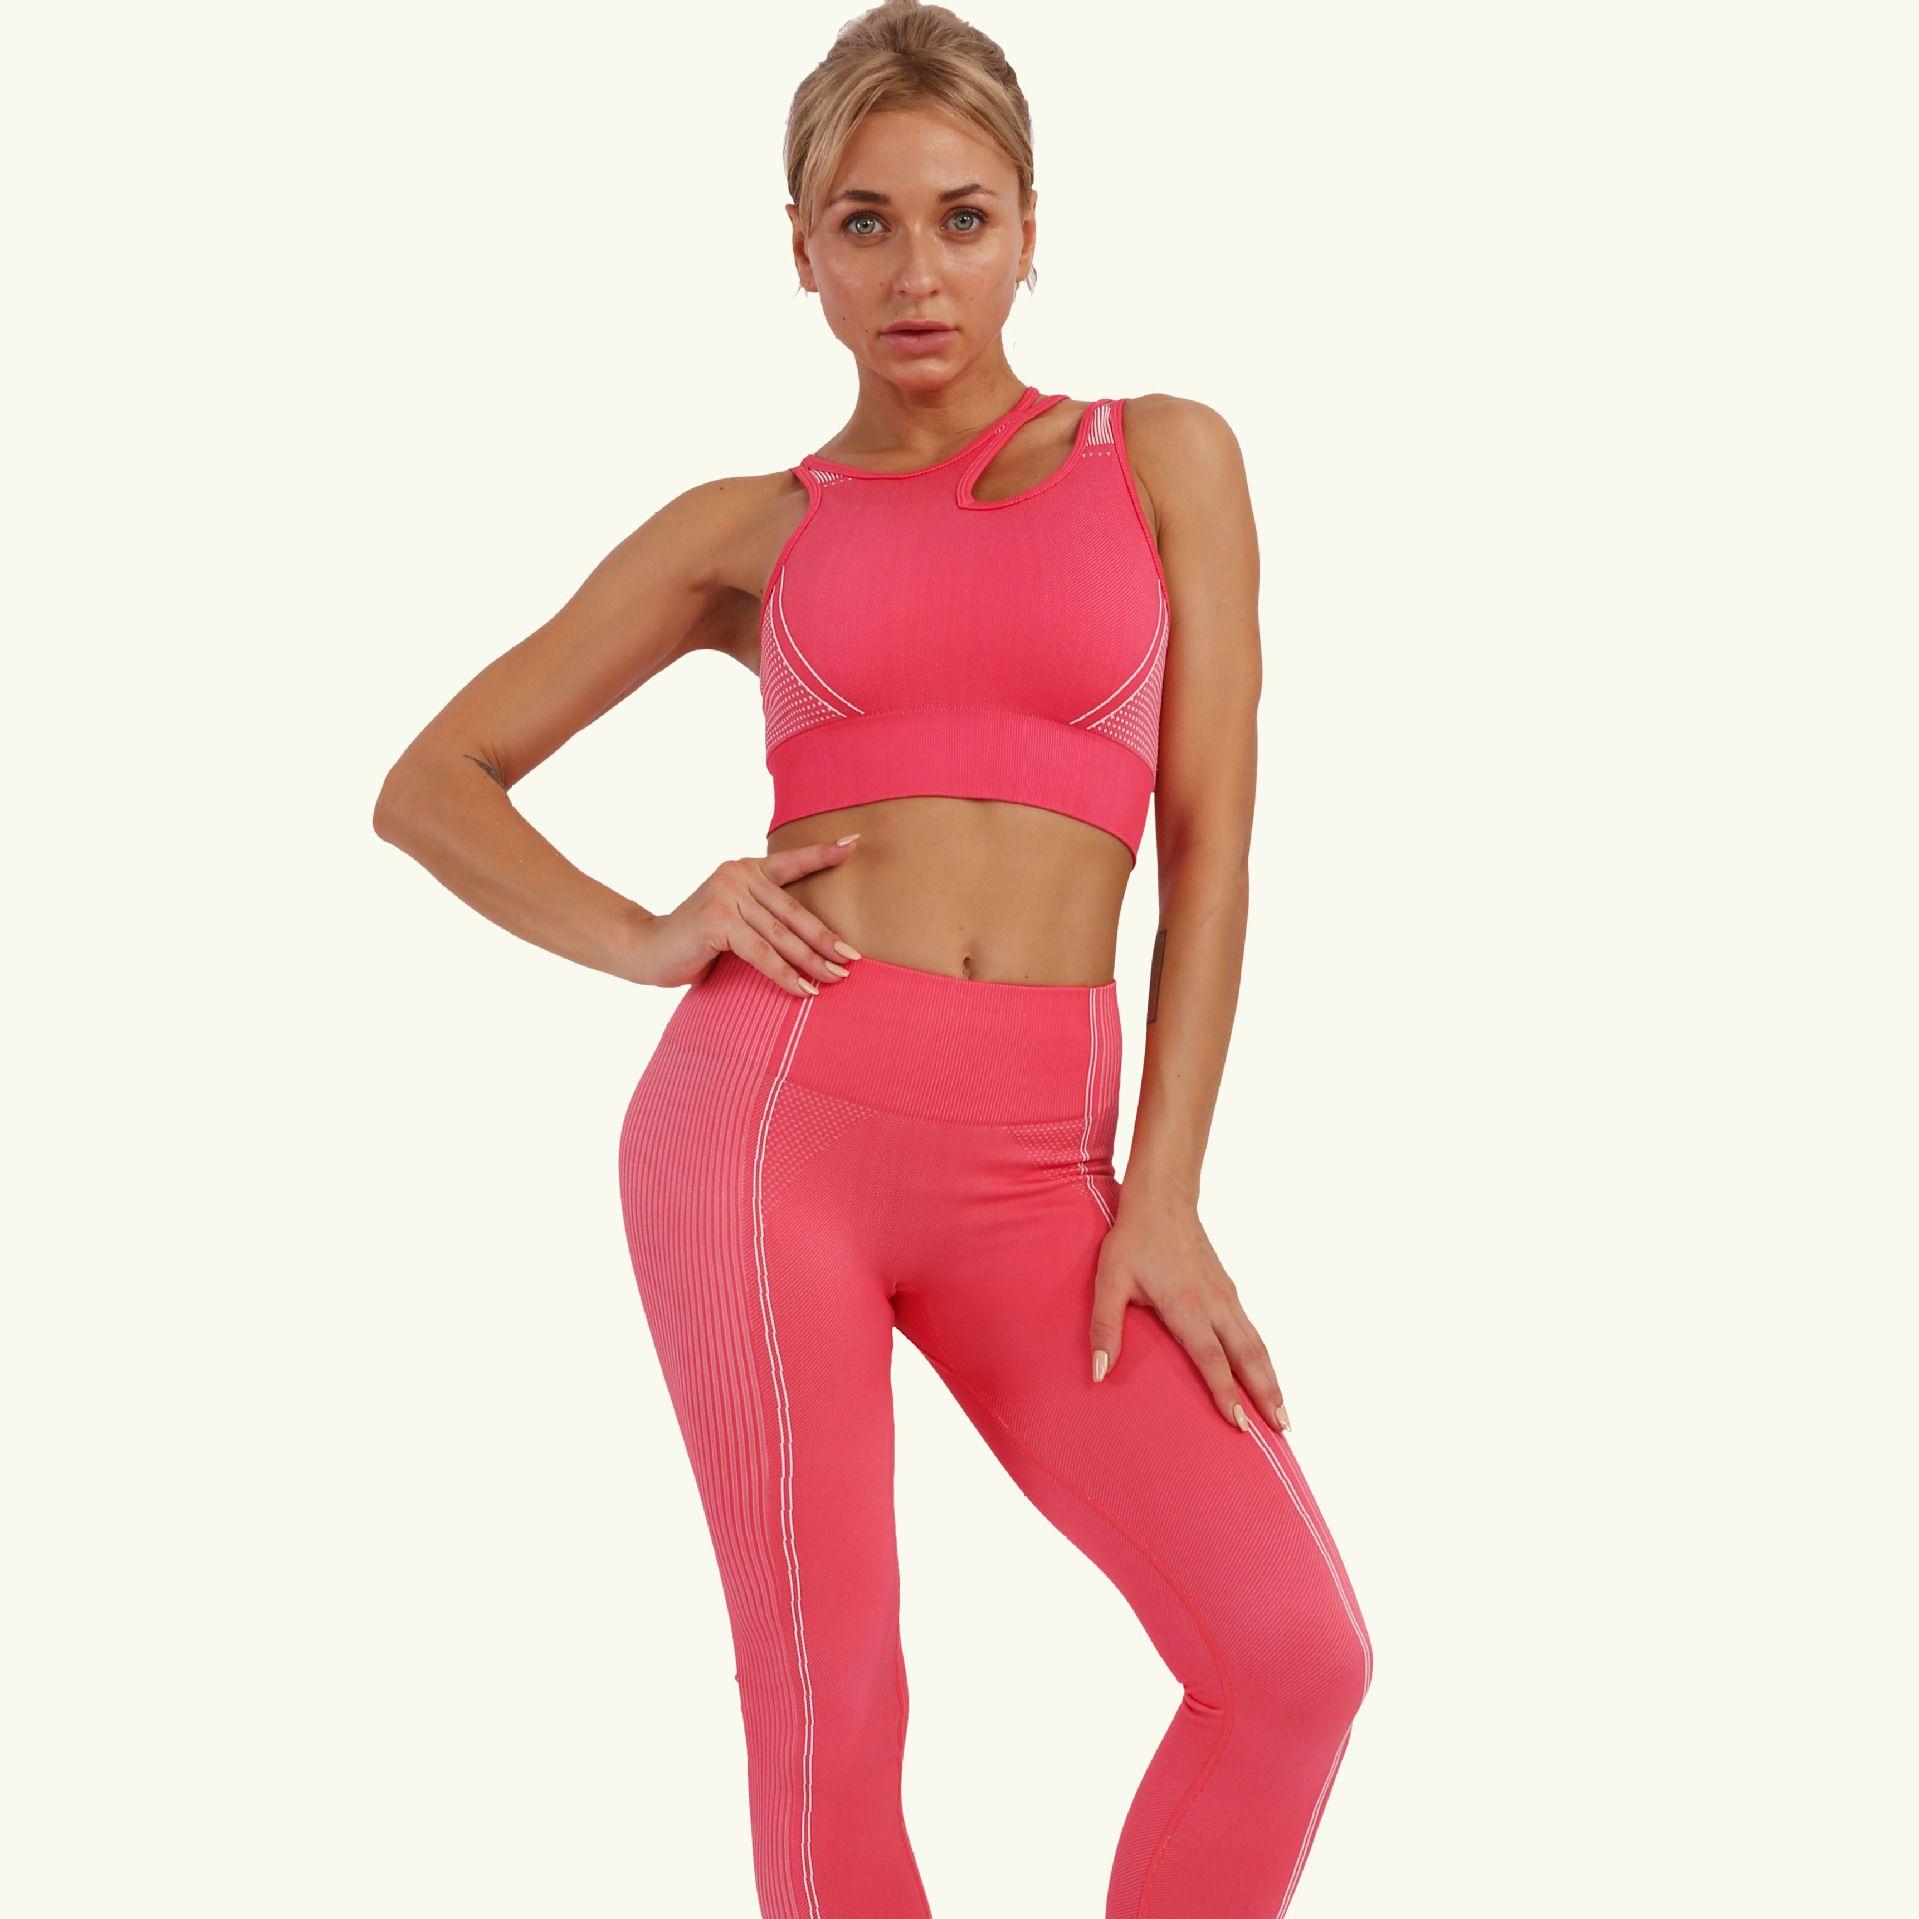 2020 Novo Estilo Amazon Yoga Roupa Terno Feminino Ginásio Roupas Athletic Calças Terno Yoga Sets -Resistant Bra